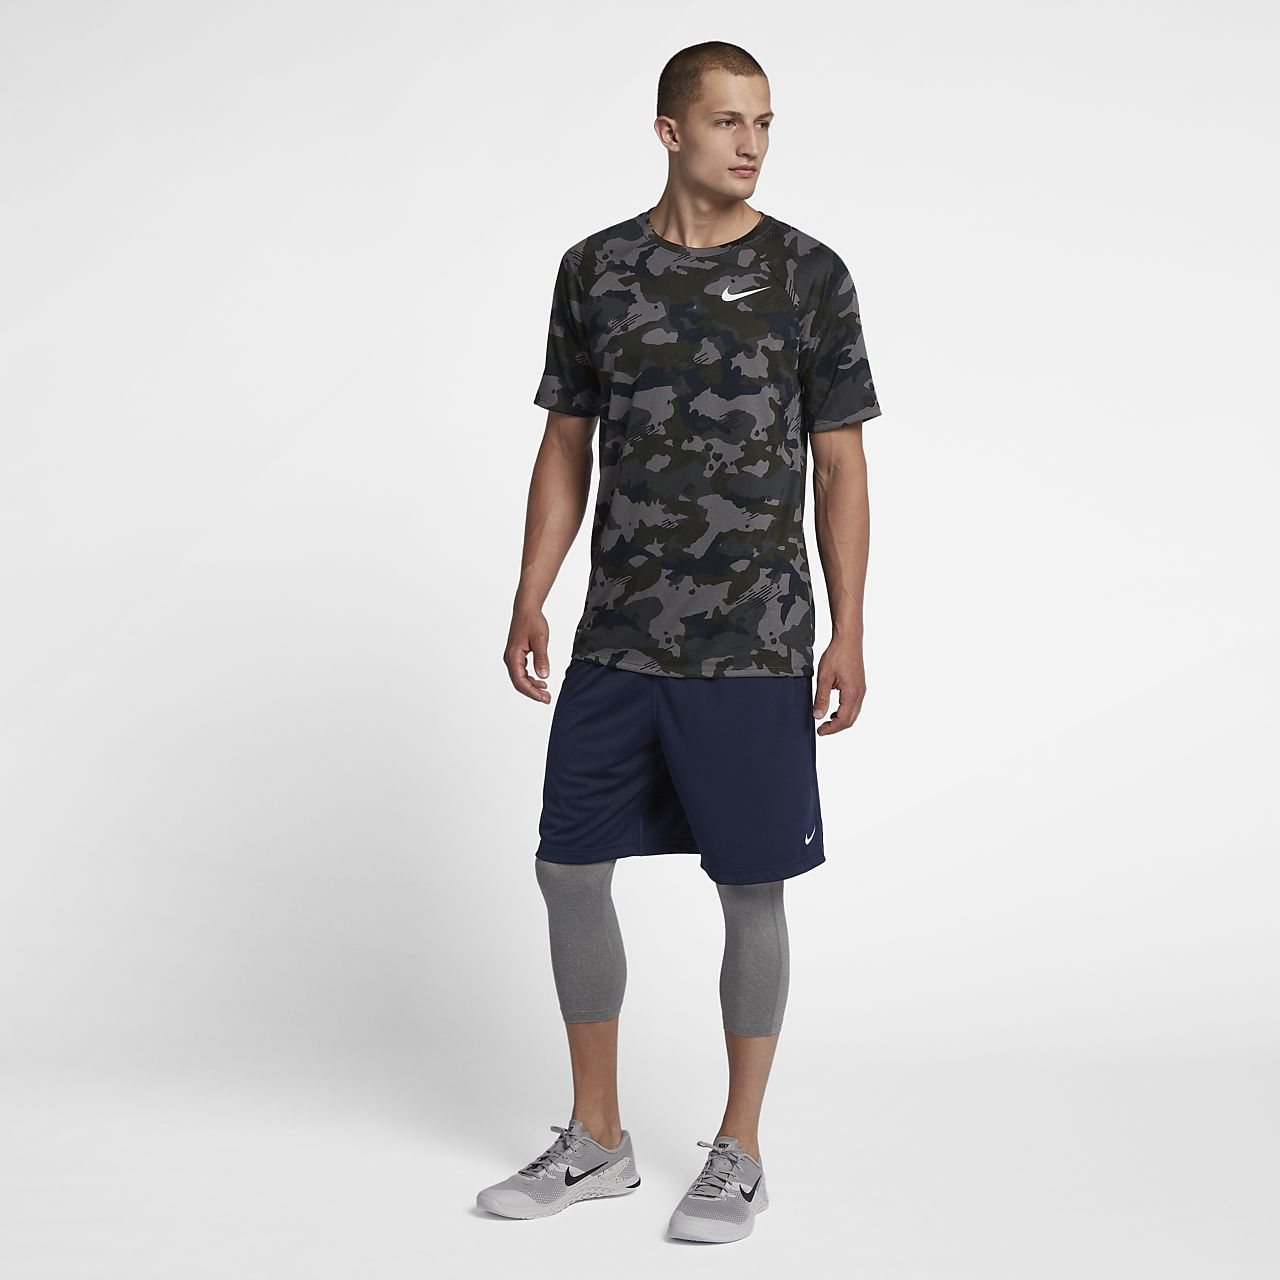 a3b56efbd Nike Dri-FIT Men's Training T-Shirt. Nike.com LU